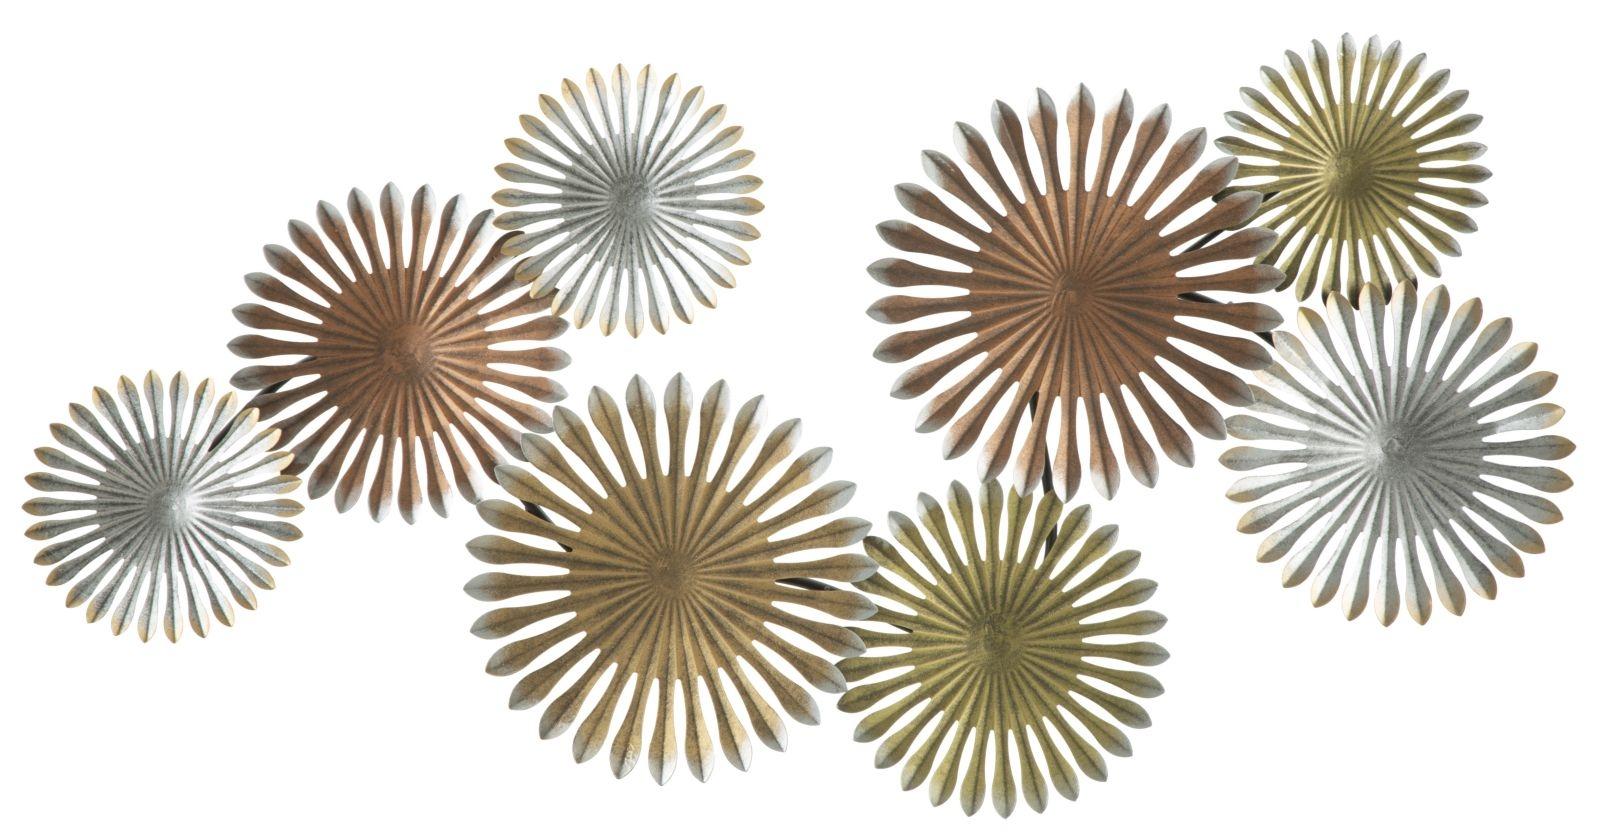 Decoratiune metalica de perete Oxy-A L1105xl5xH53 cm